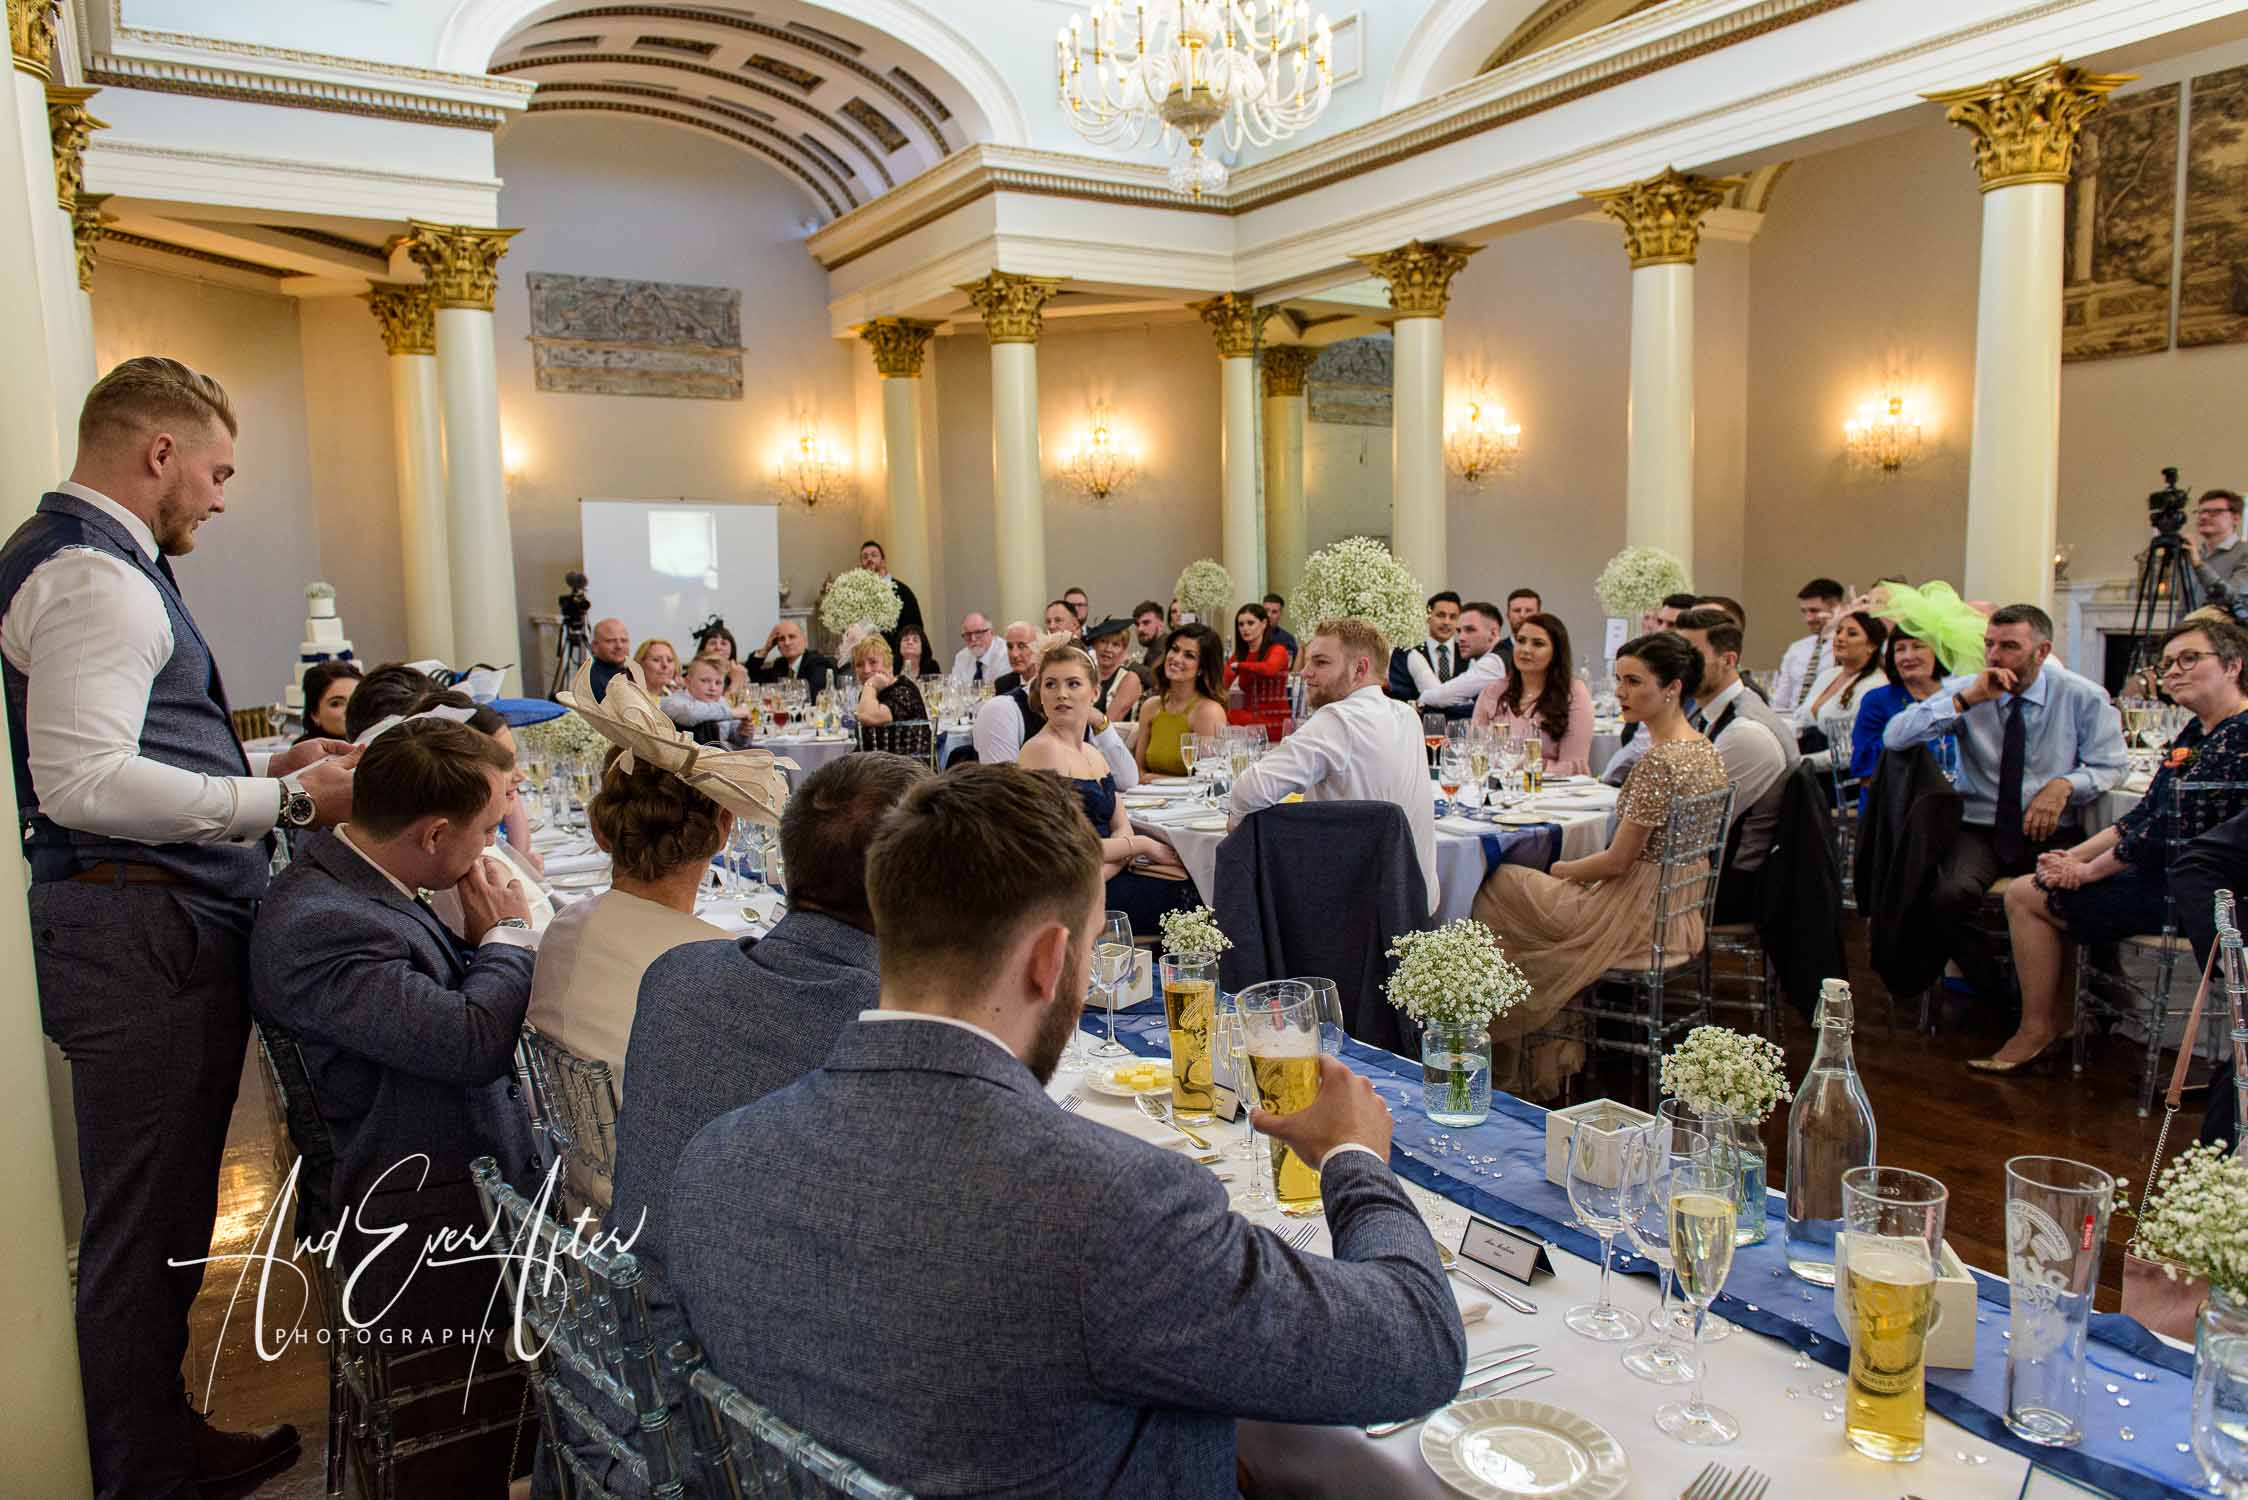 lartington hall wedding venue, wedding breakfast speeches